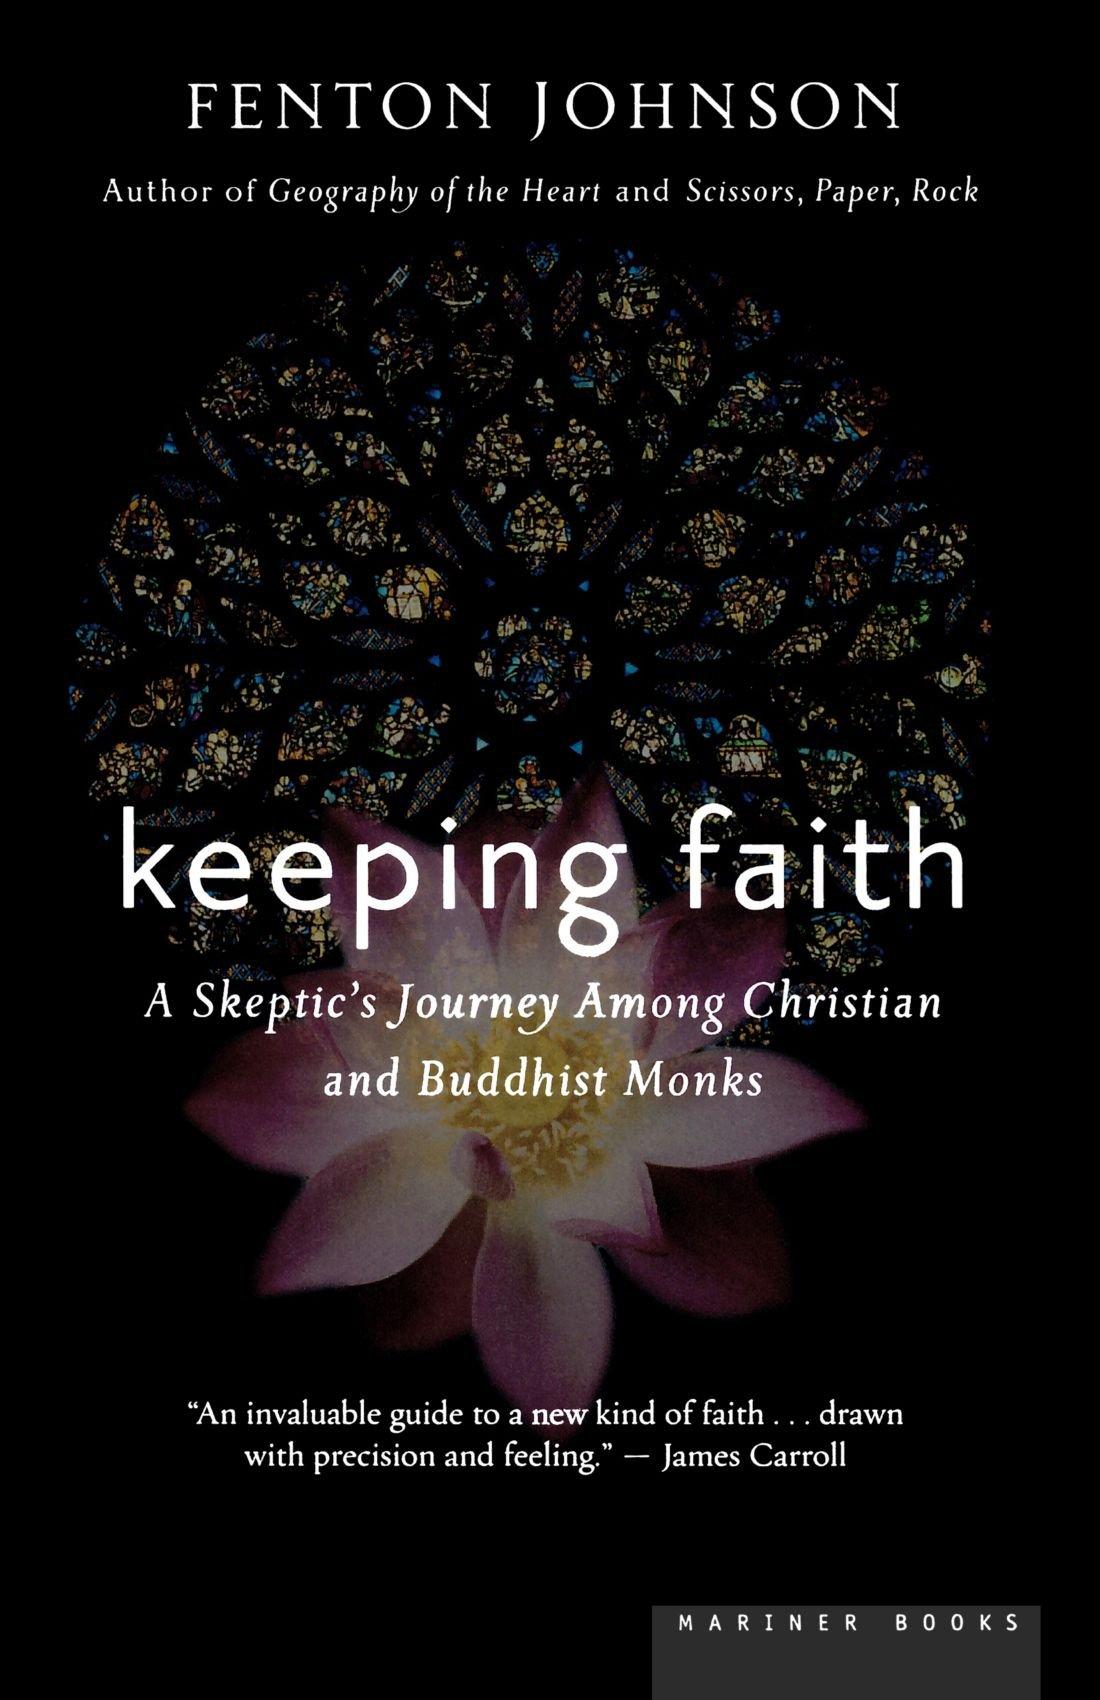 Download Keeping Faith Pa ebook